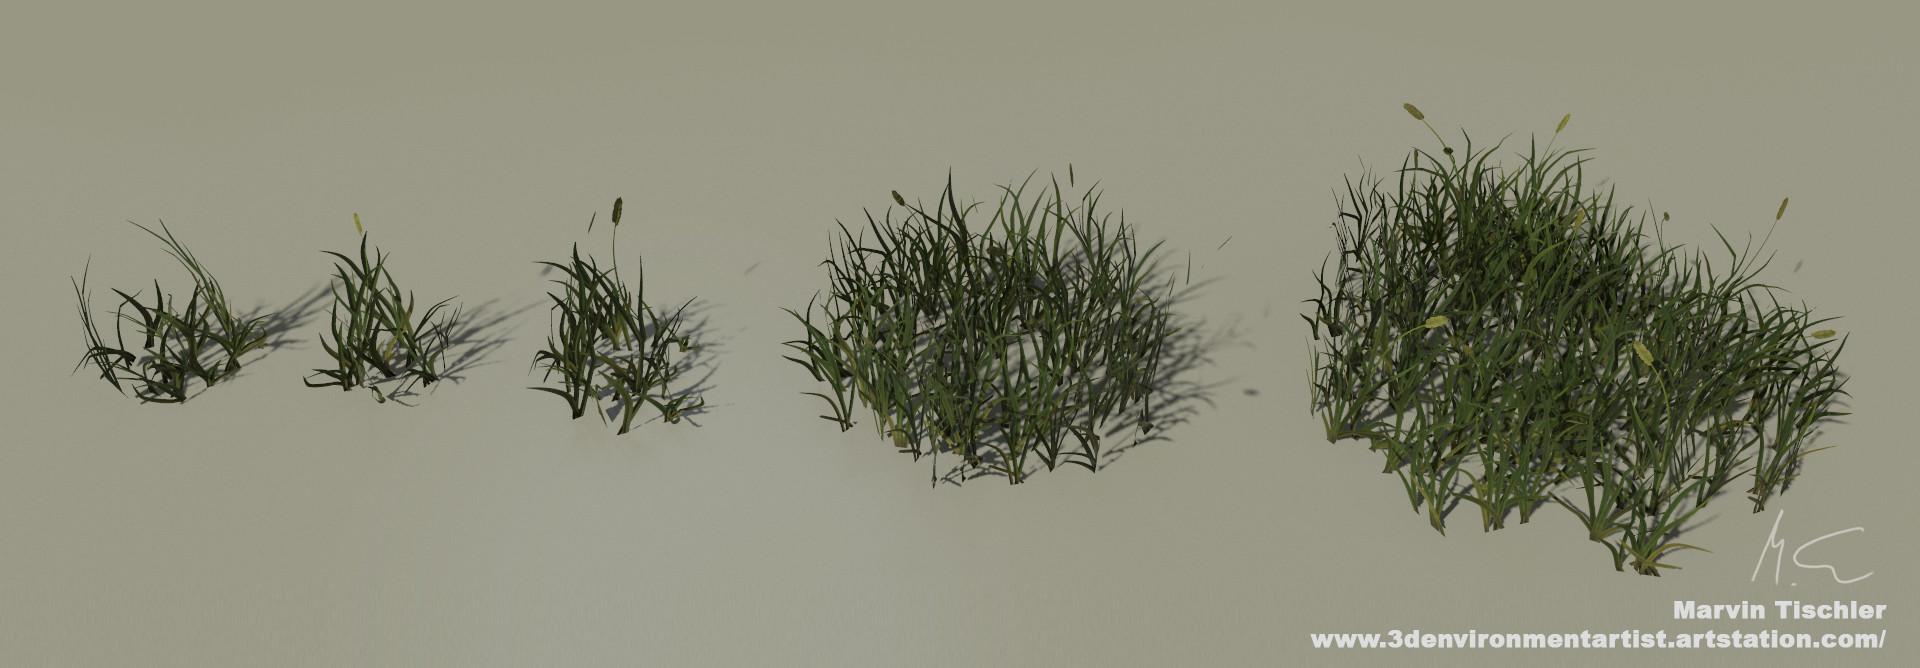 Marvin tischler plants 001 h